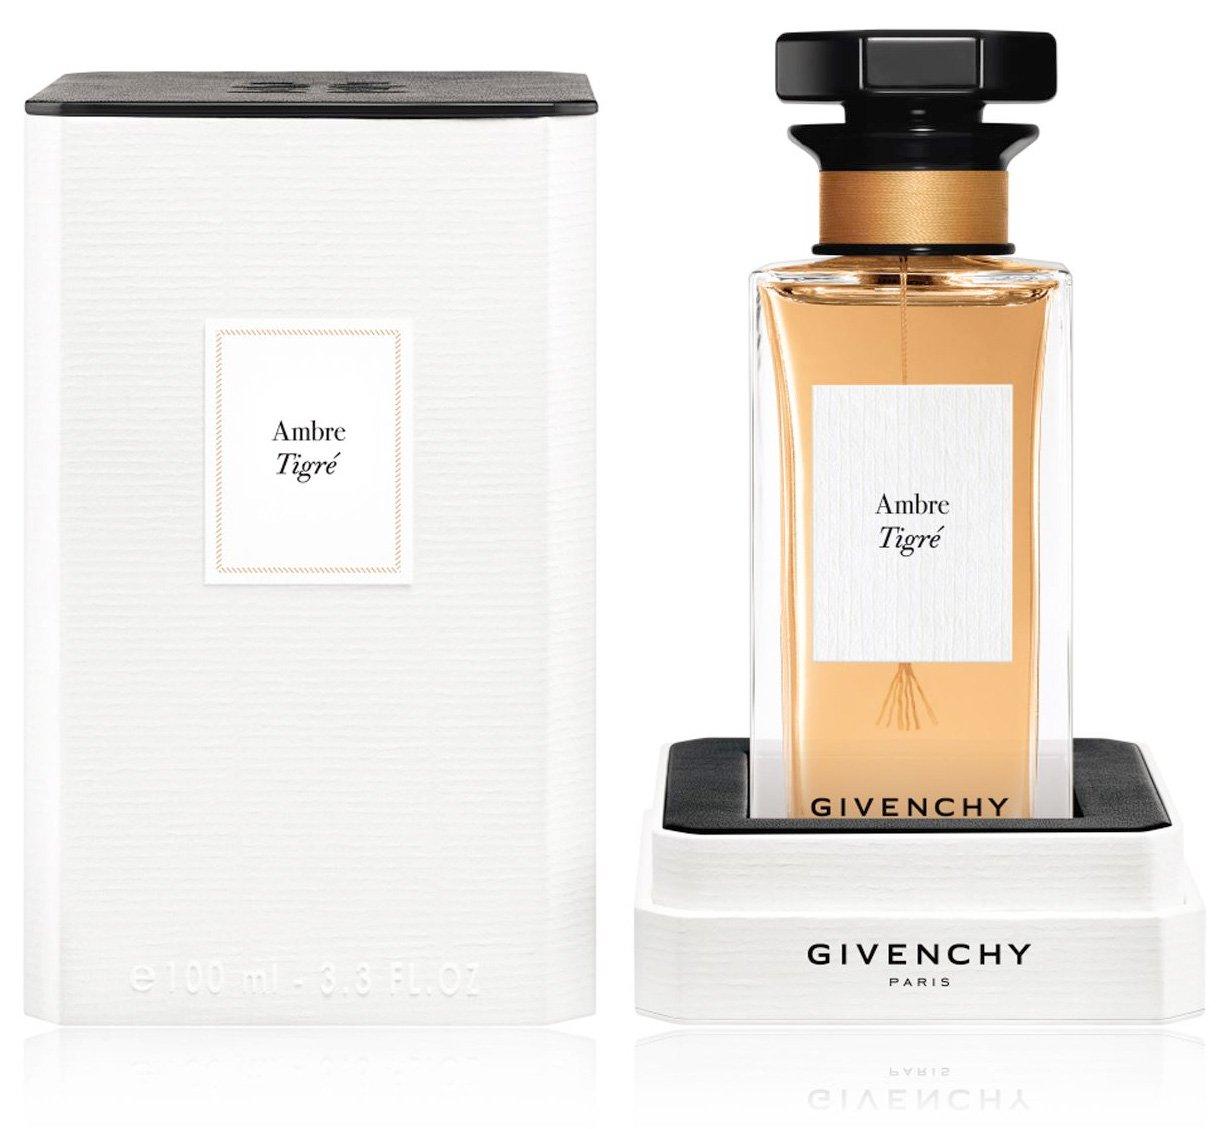 Givenchy Ambre Tigre